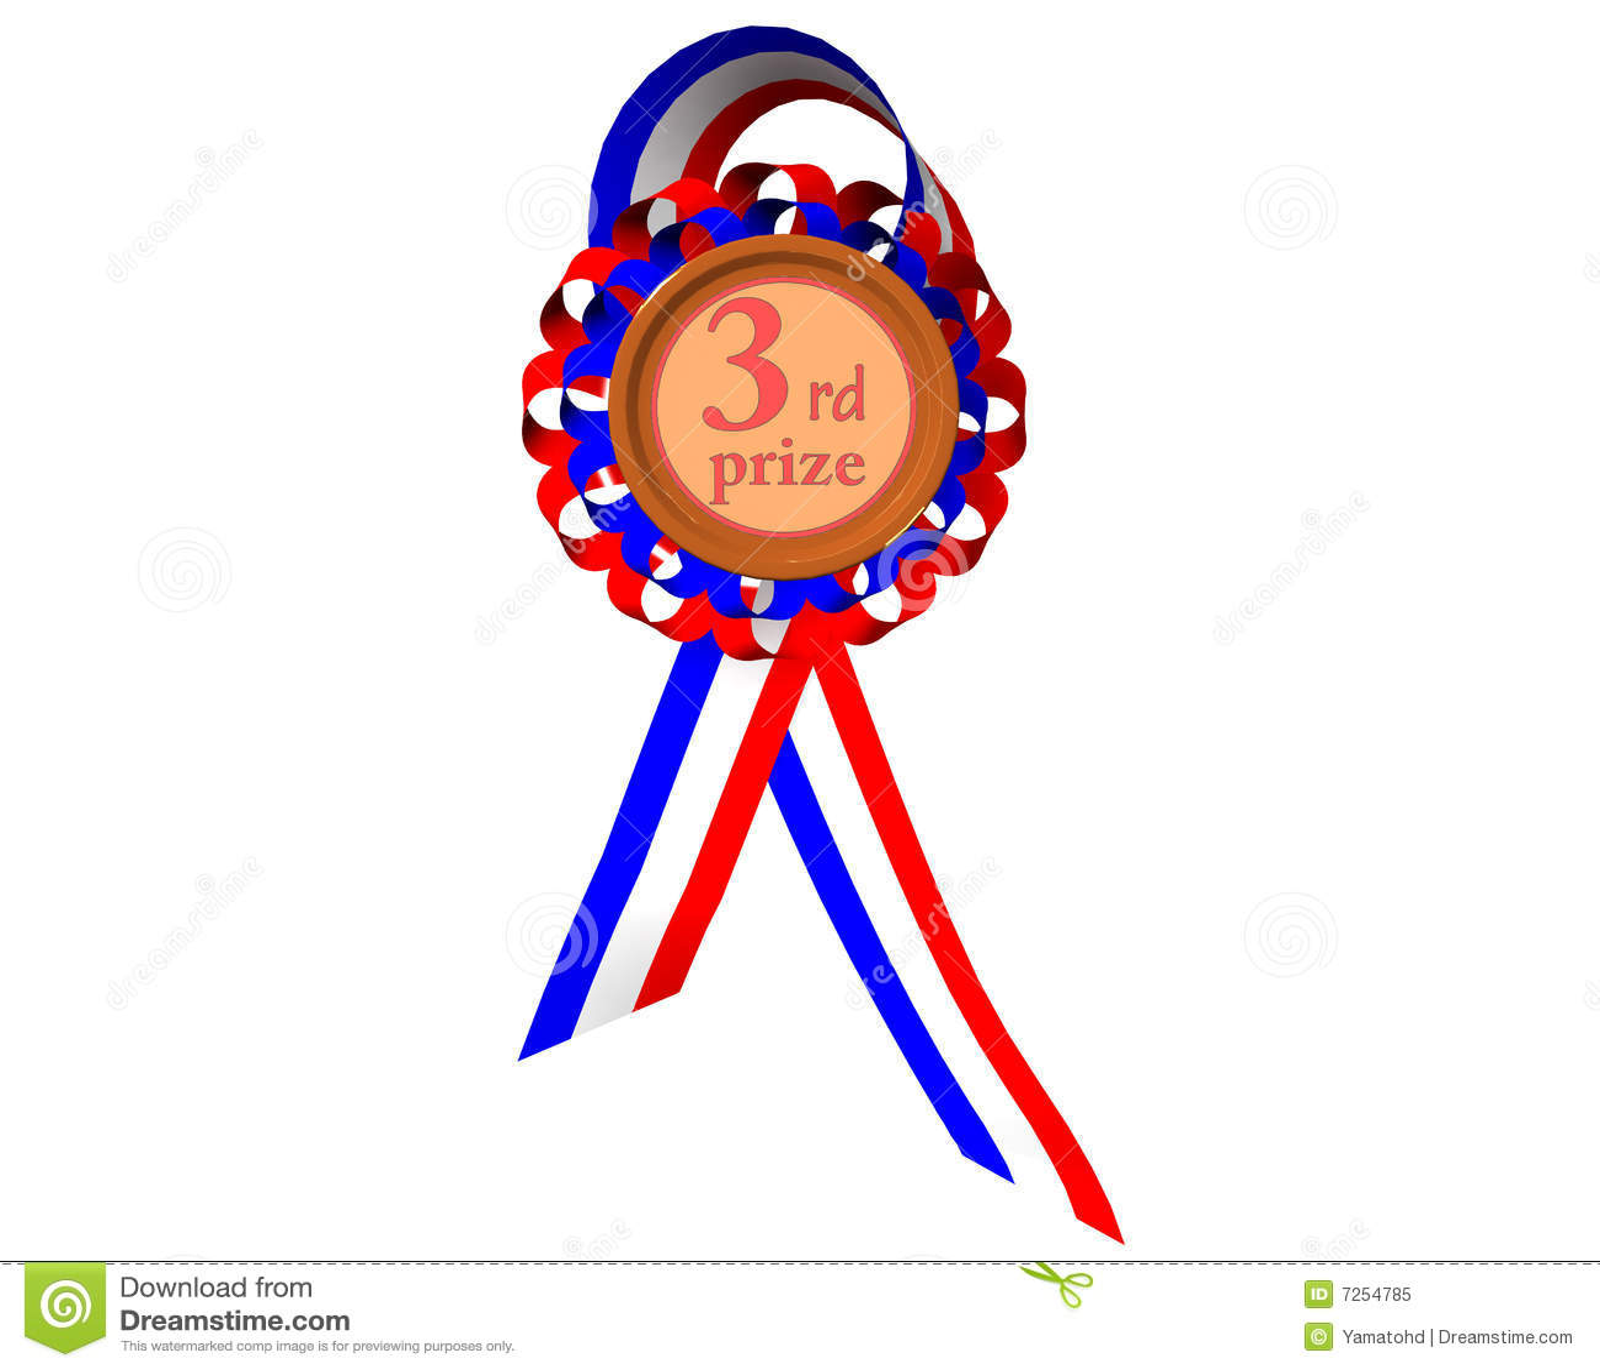 Third prize medal stock illustration. Illustration of icon ...